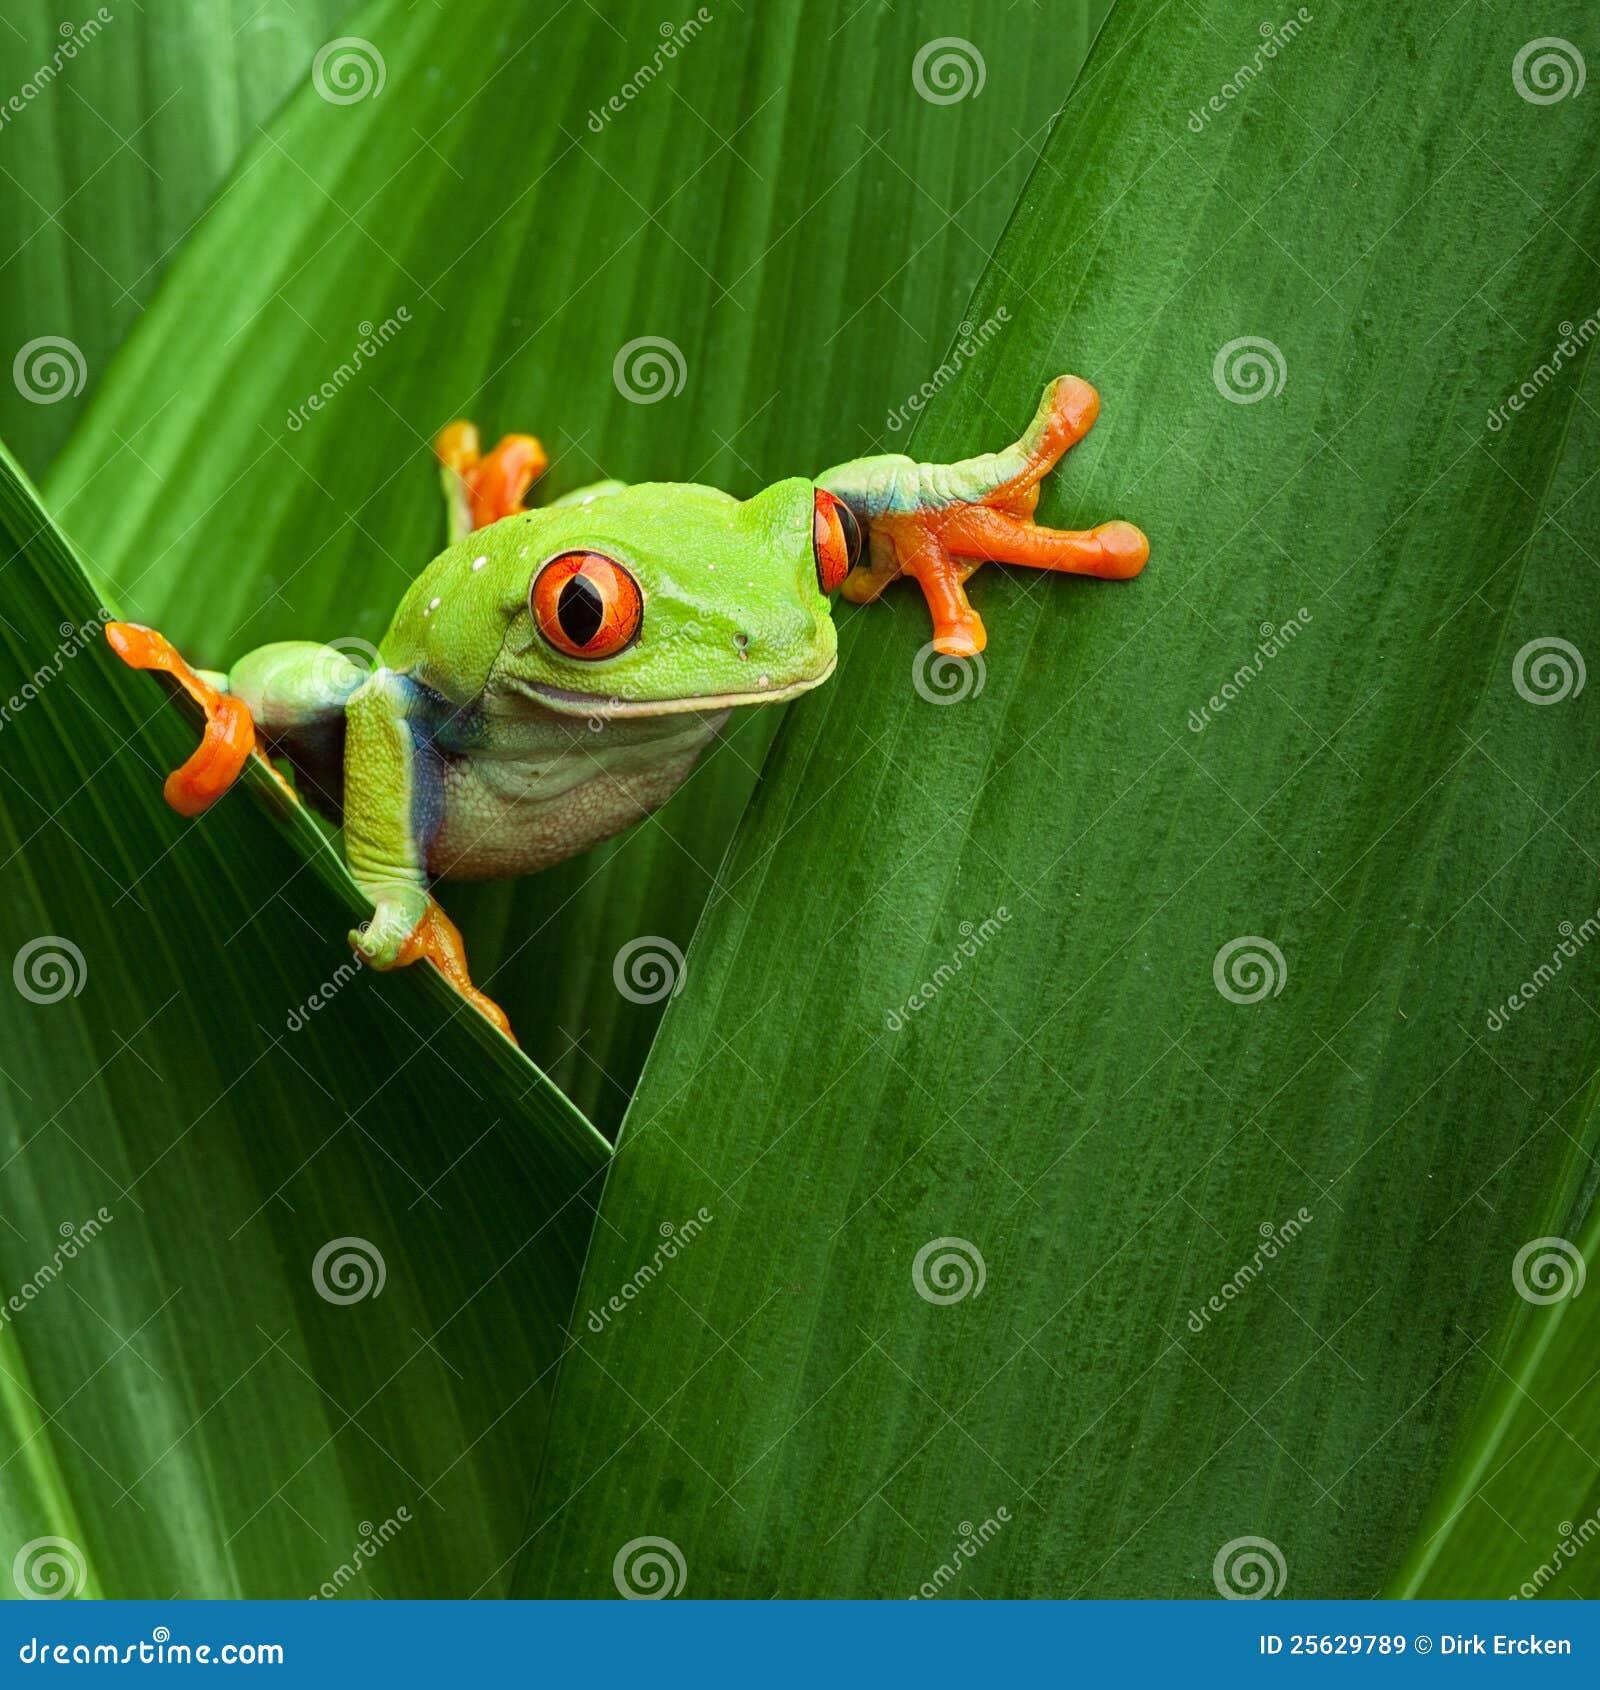 Red eyed tree frog big eye curiosity royalty free stock images image